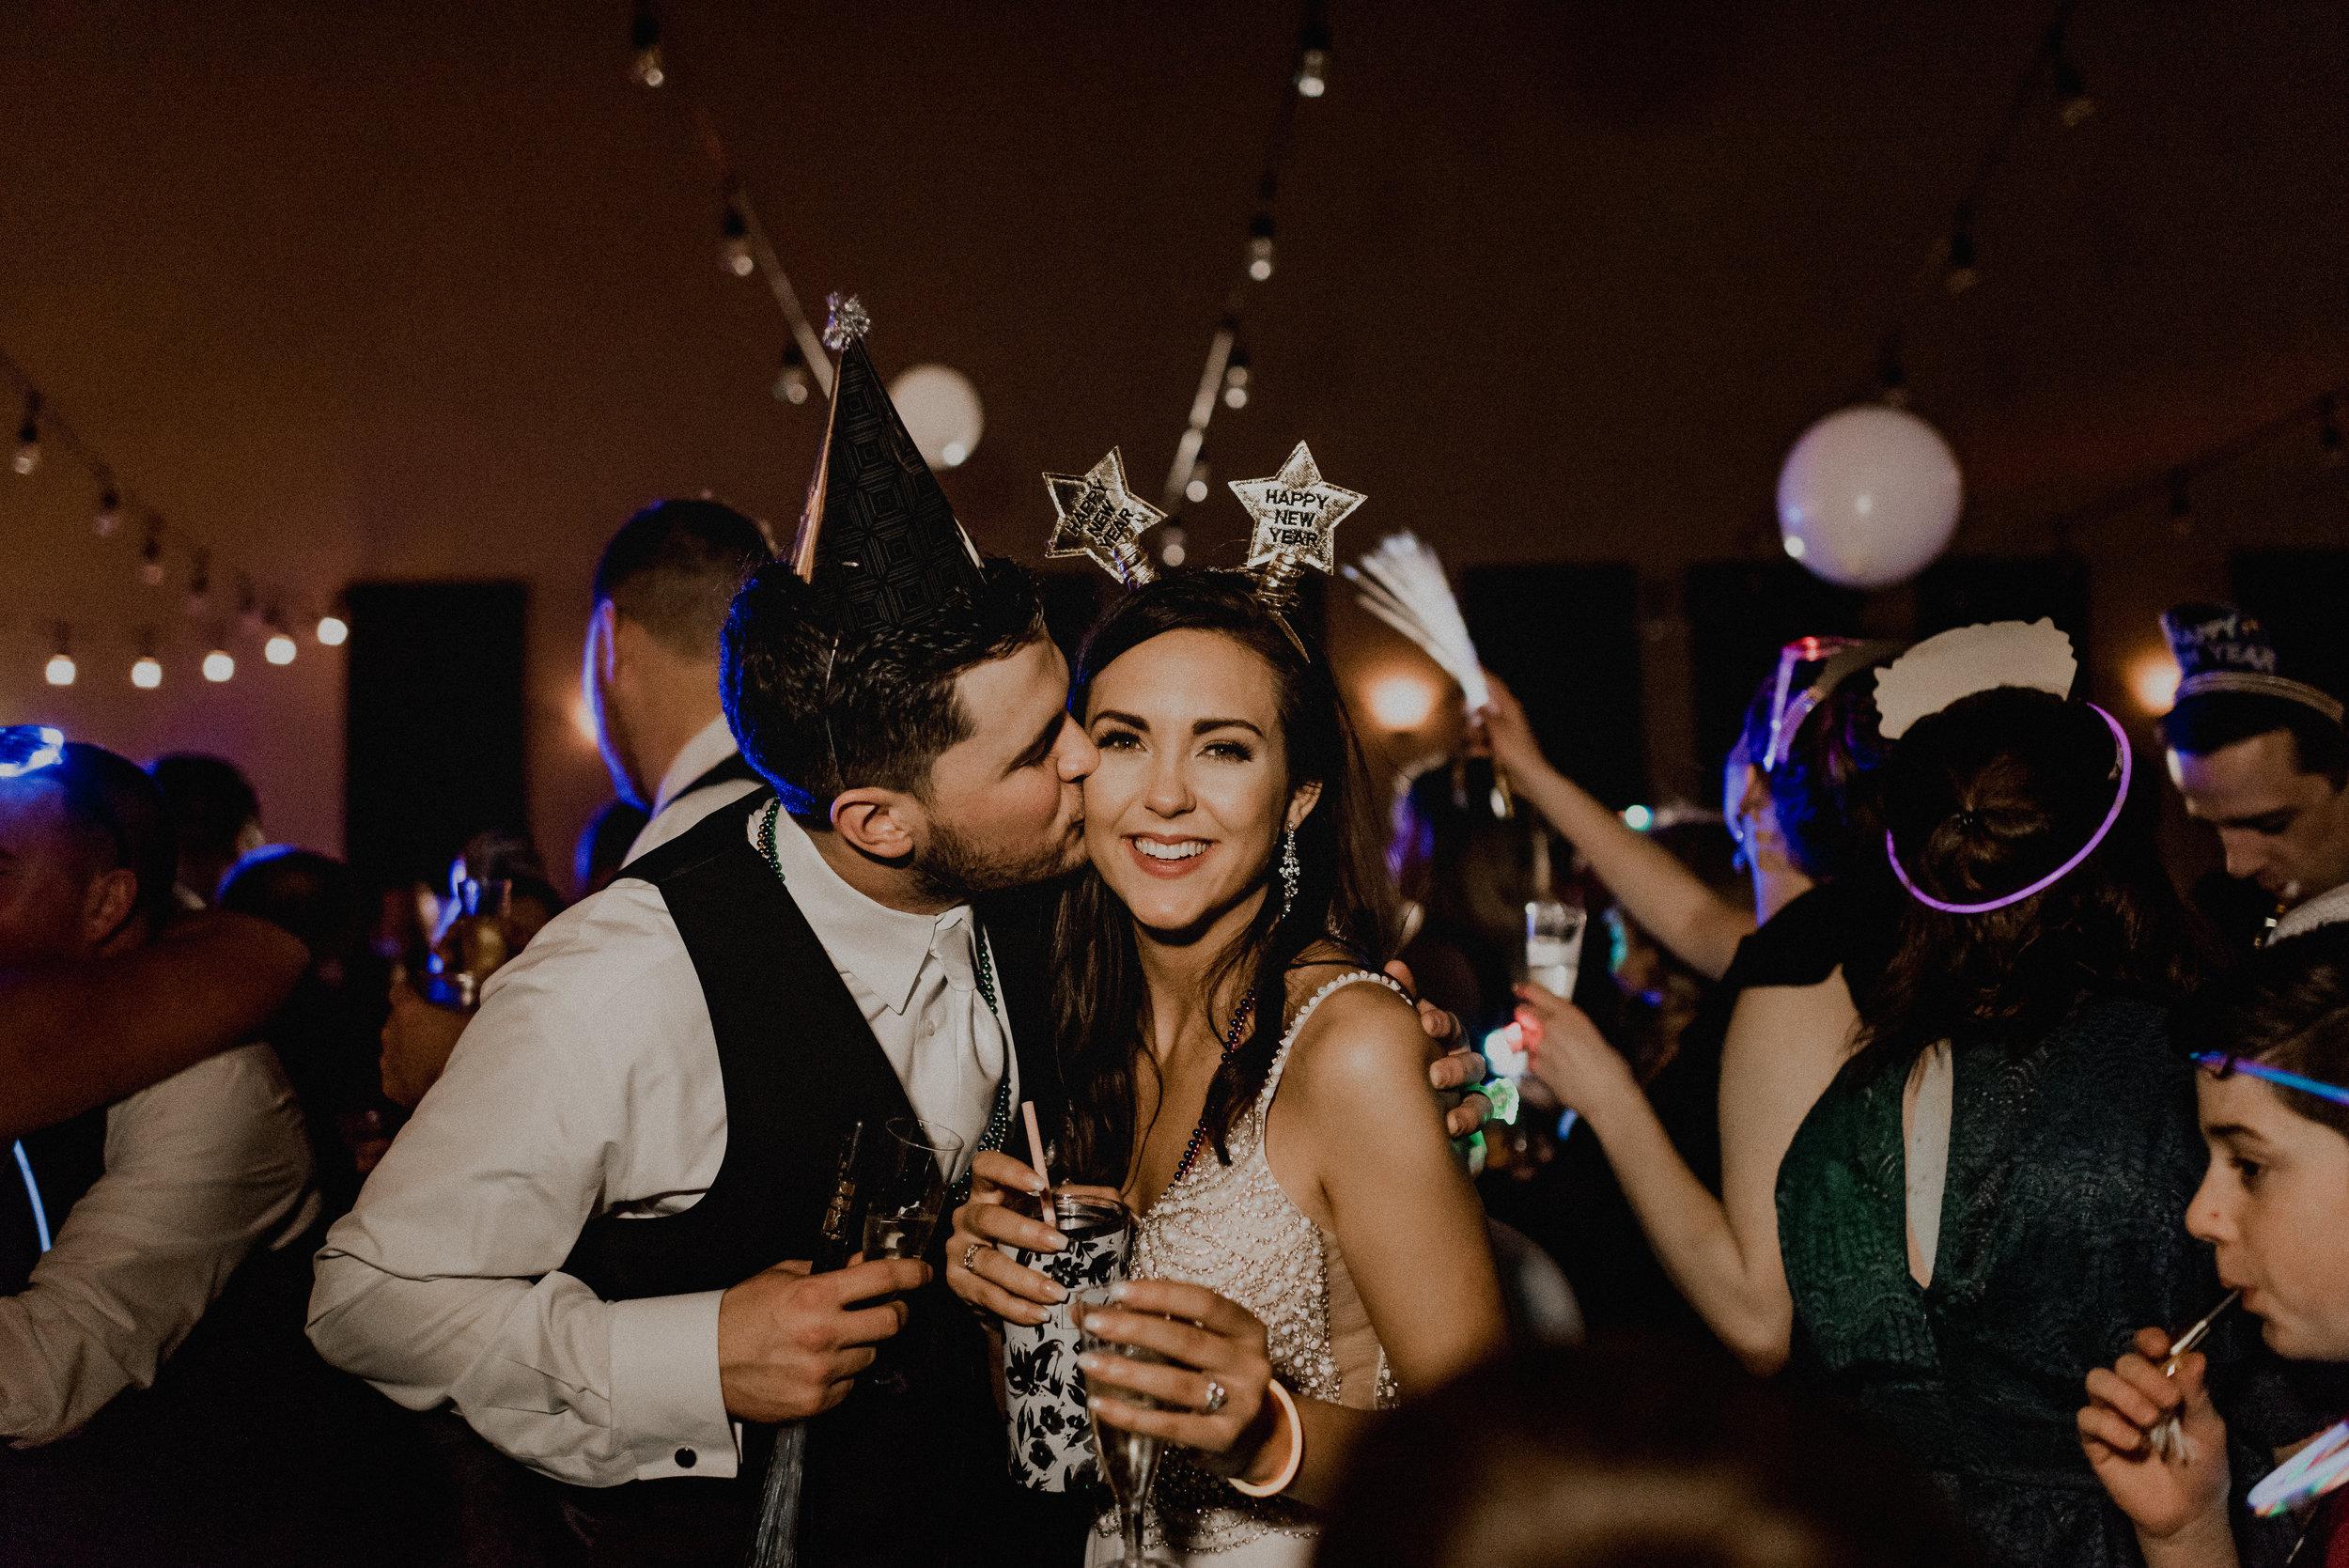 Melissa Cervantes Photography - Iowa + Midwest + Destination Wedding + Elopement Photographer - Burling Wedding - -1187.JPG